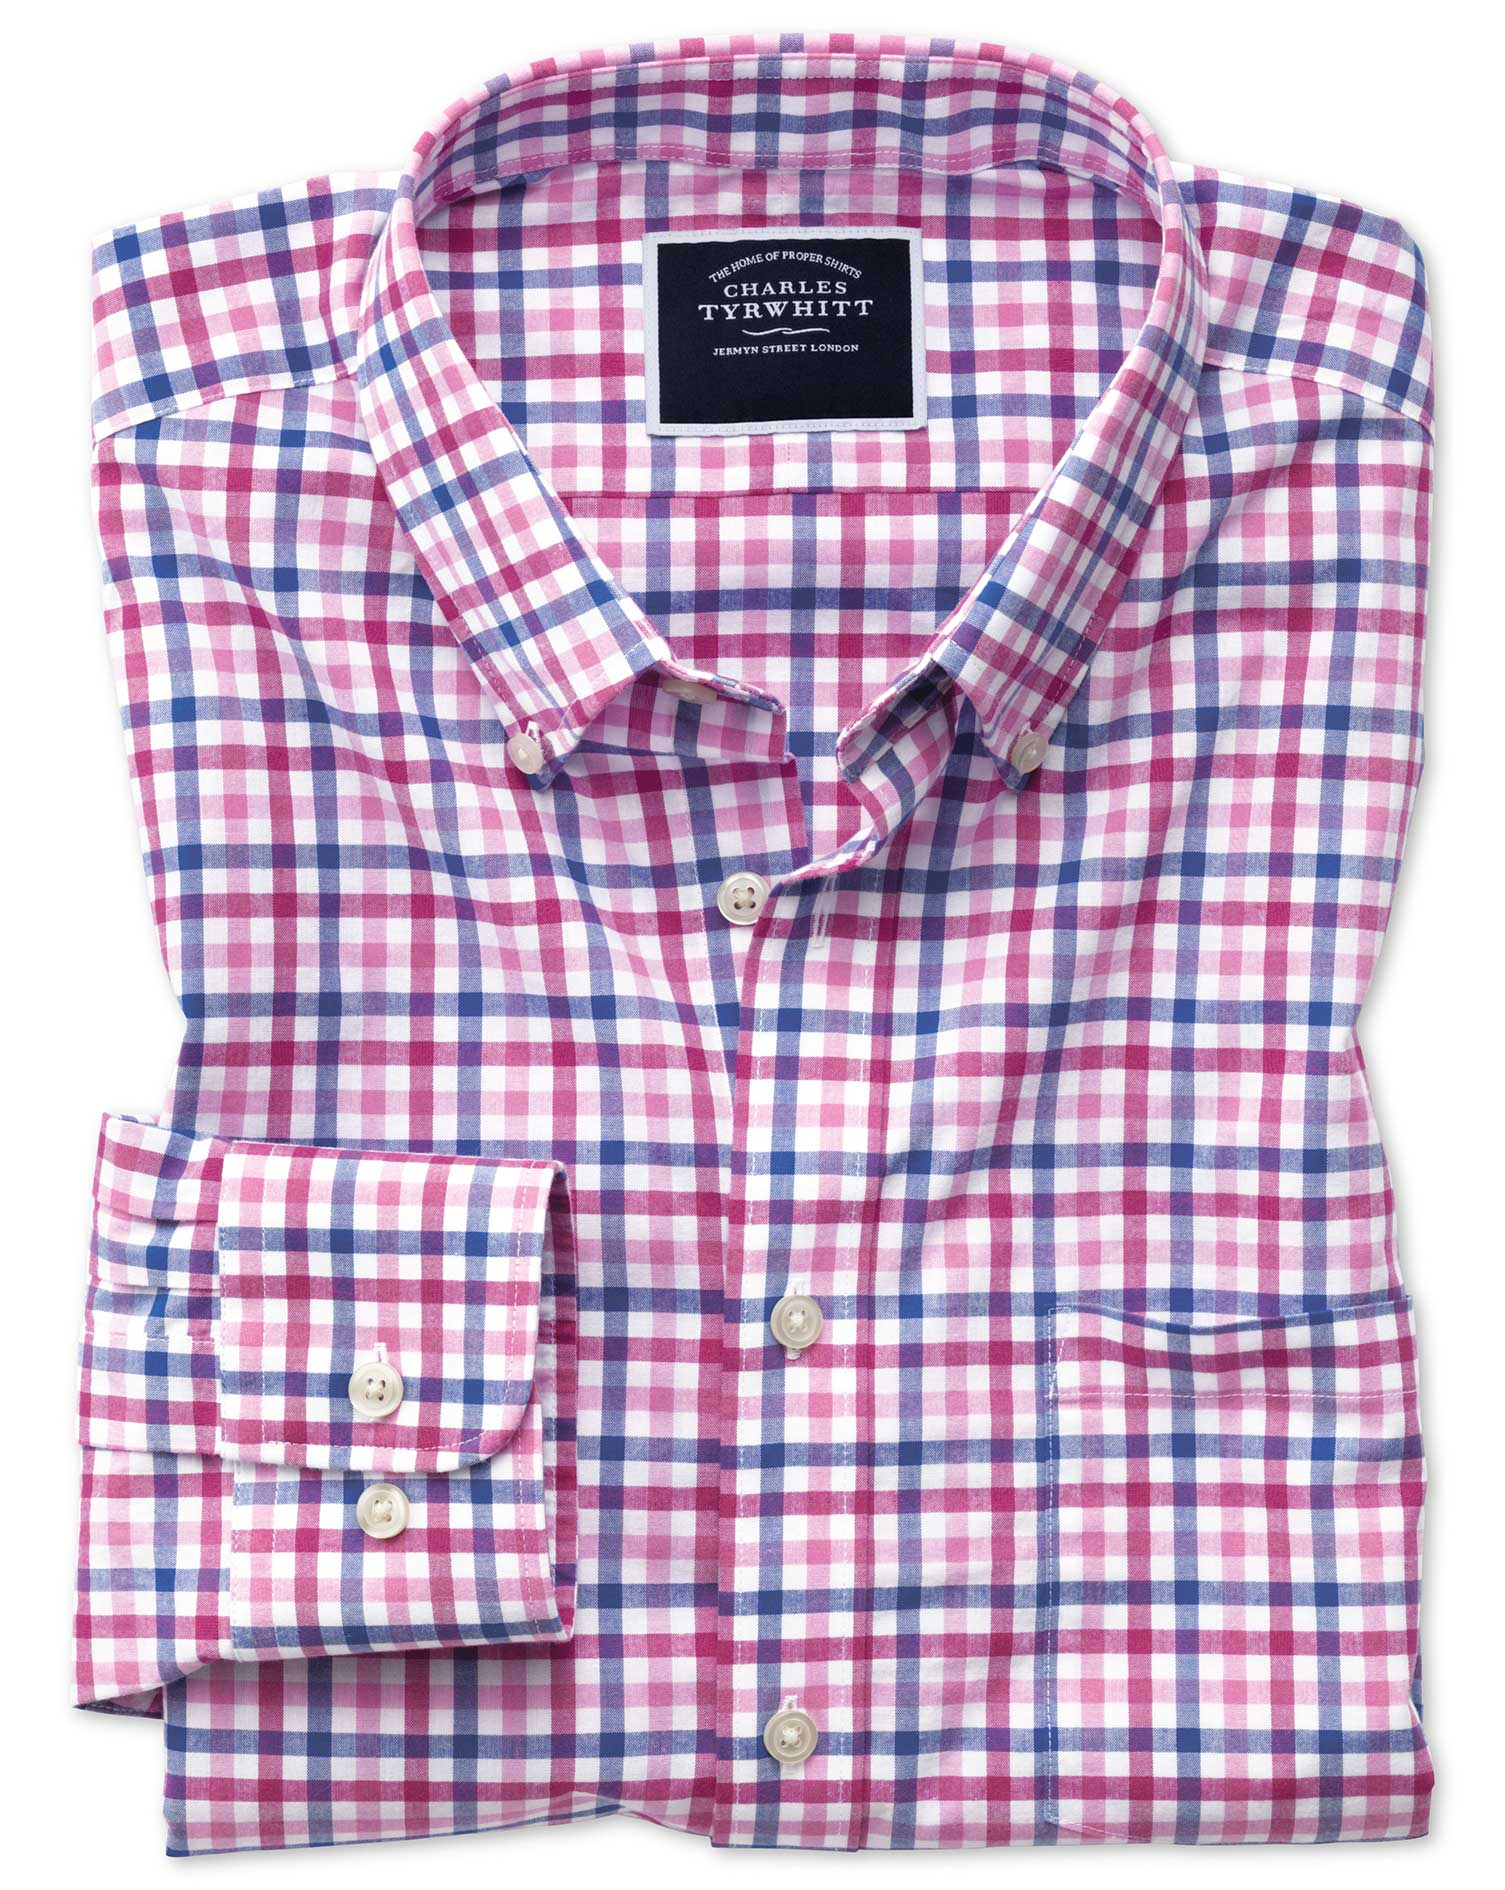 Slim Fit Poplin Pink Multi Gingham Cotton Shirt Single Cuff Size XL by Charles Tyrwhitt